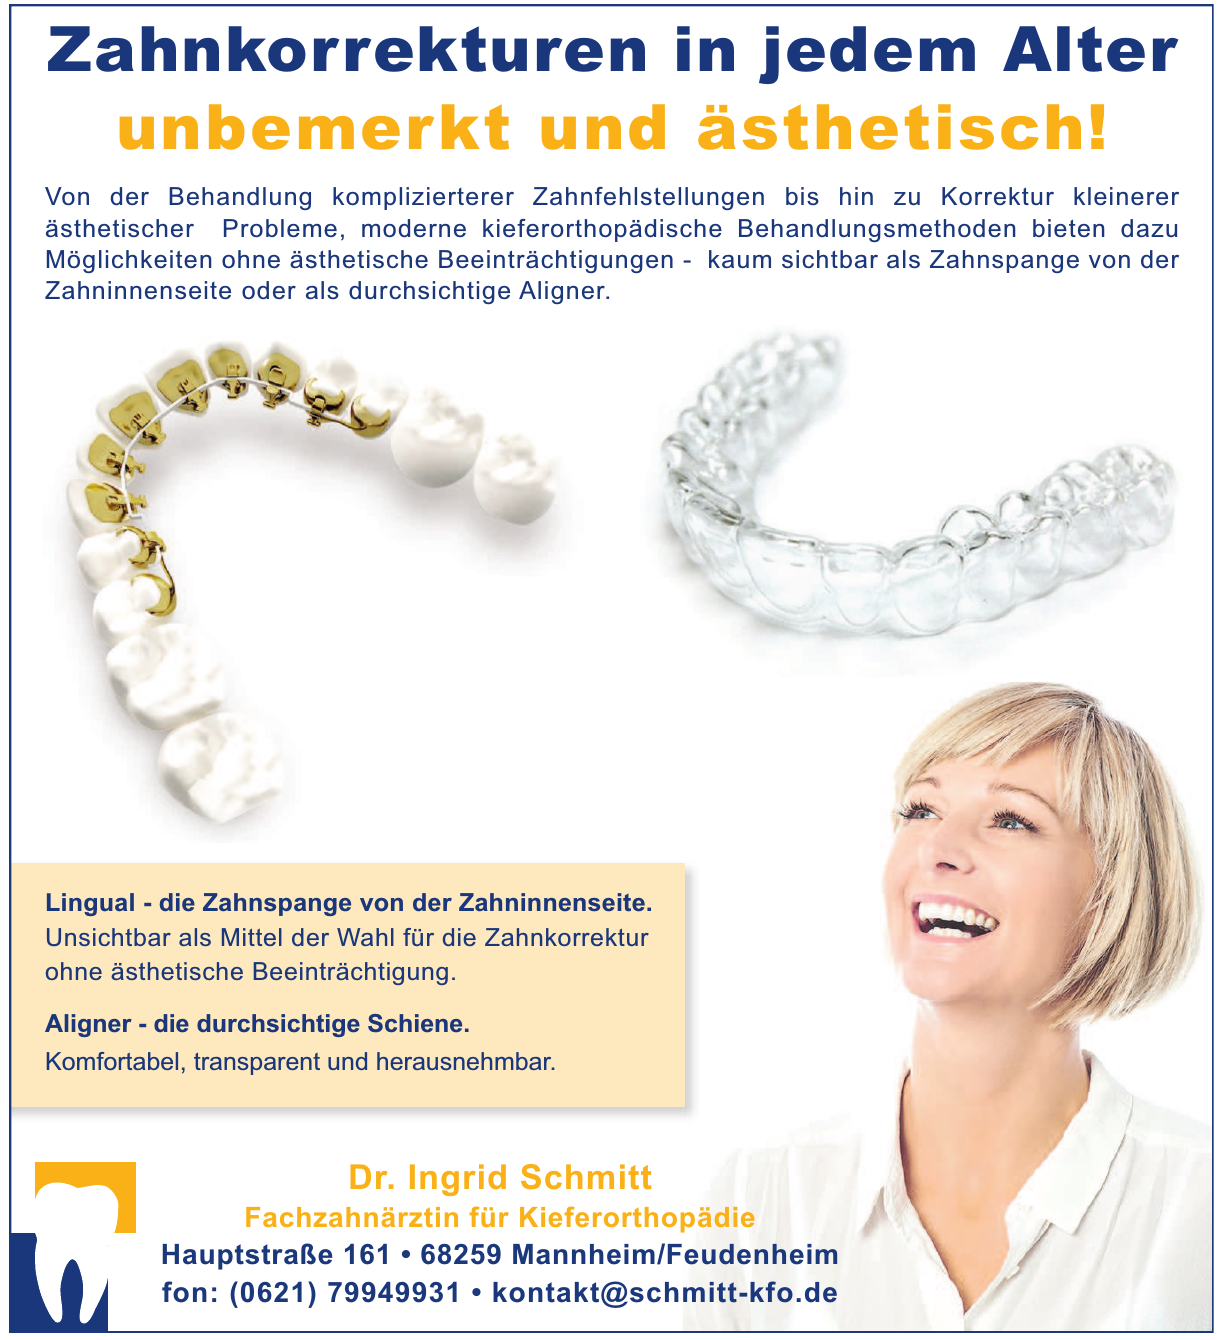 Dr. Ingrid Schmitt